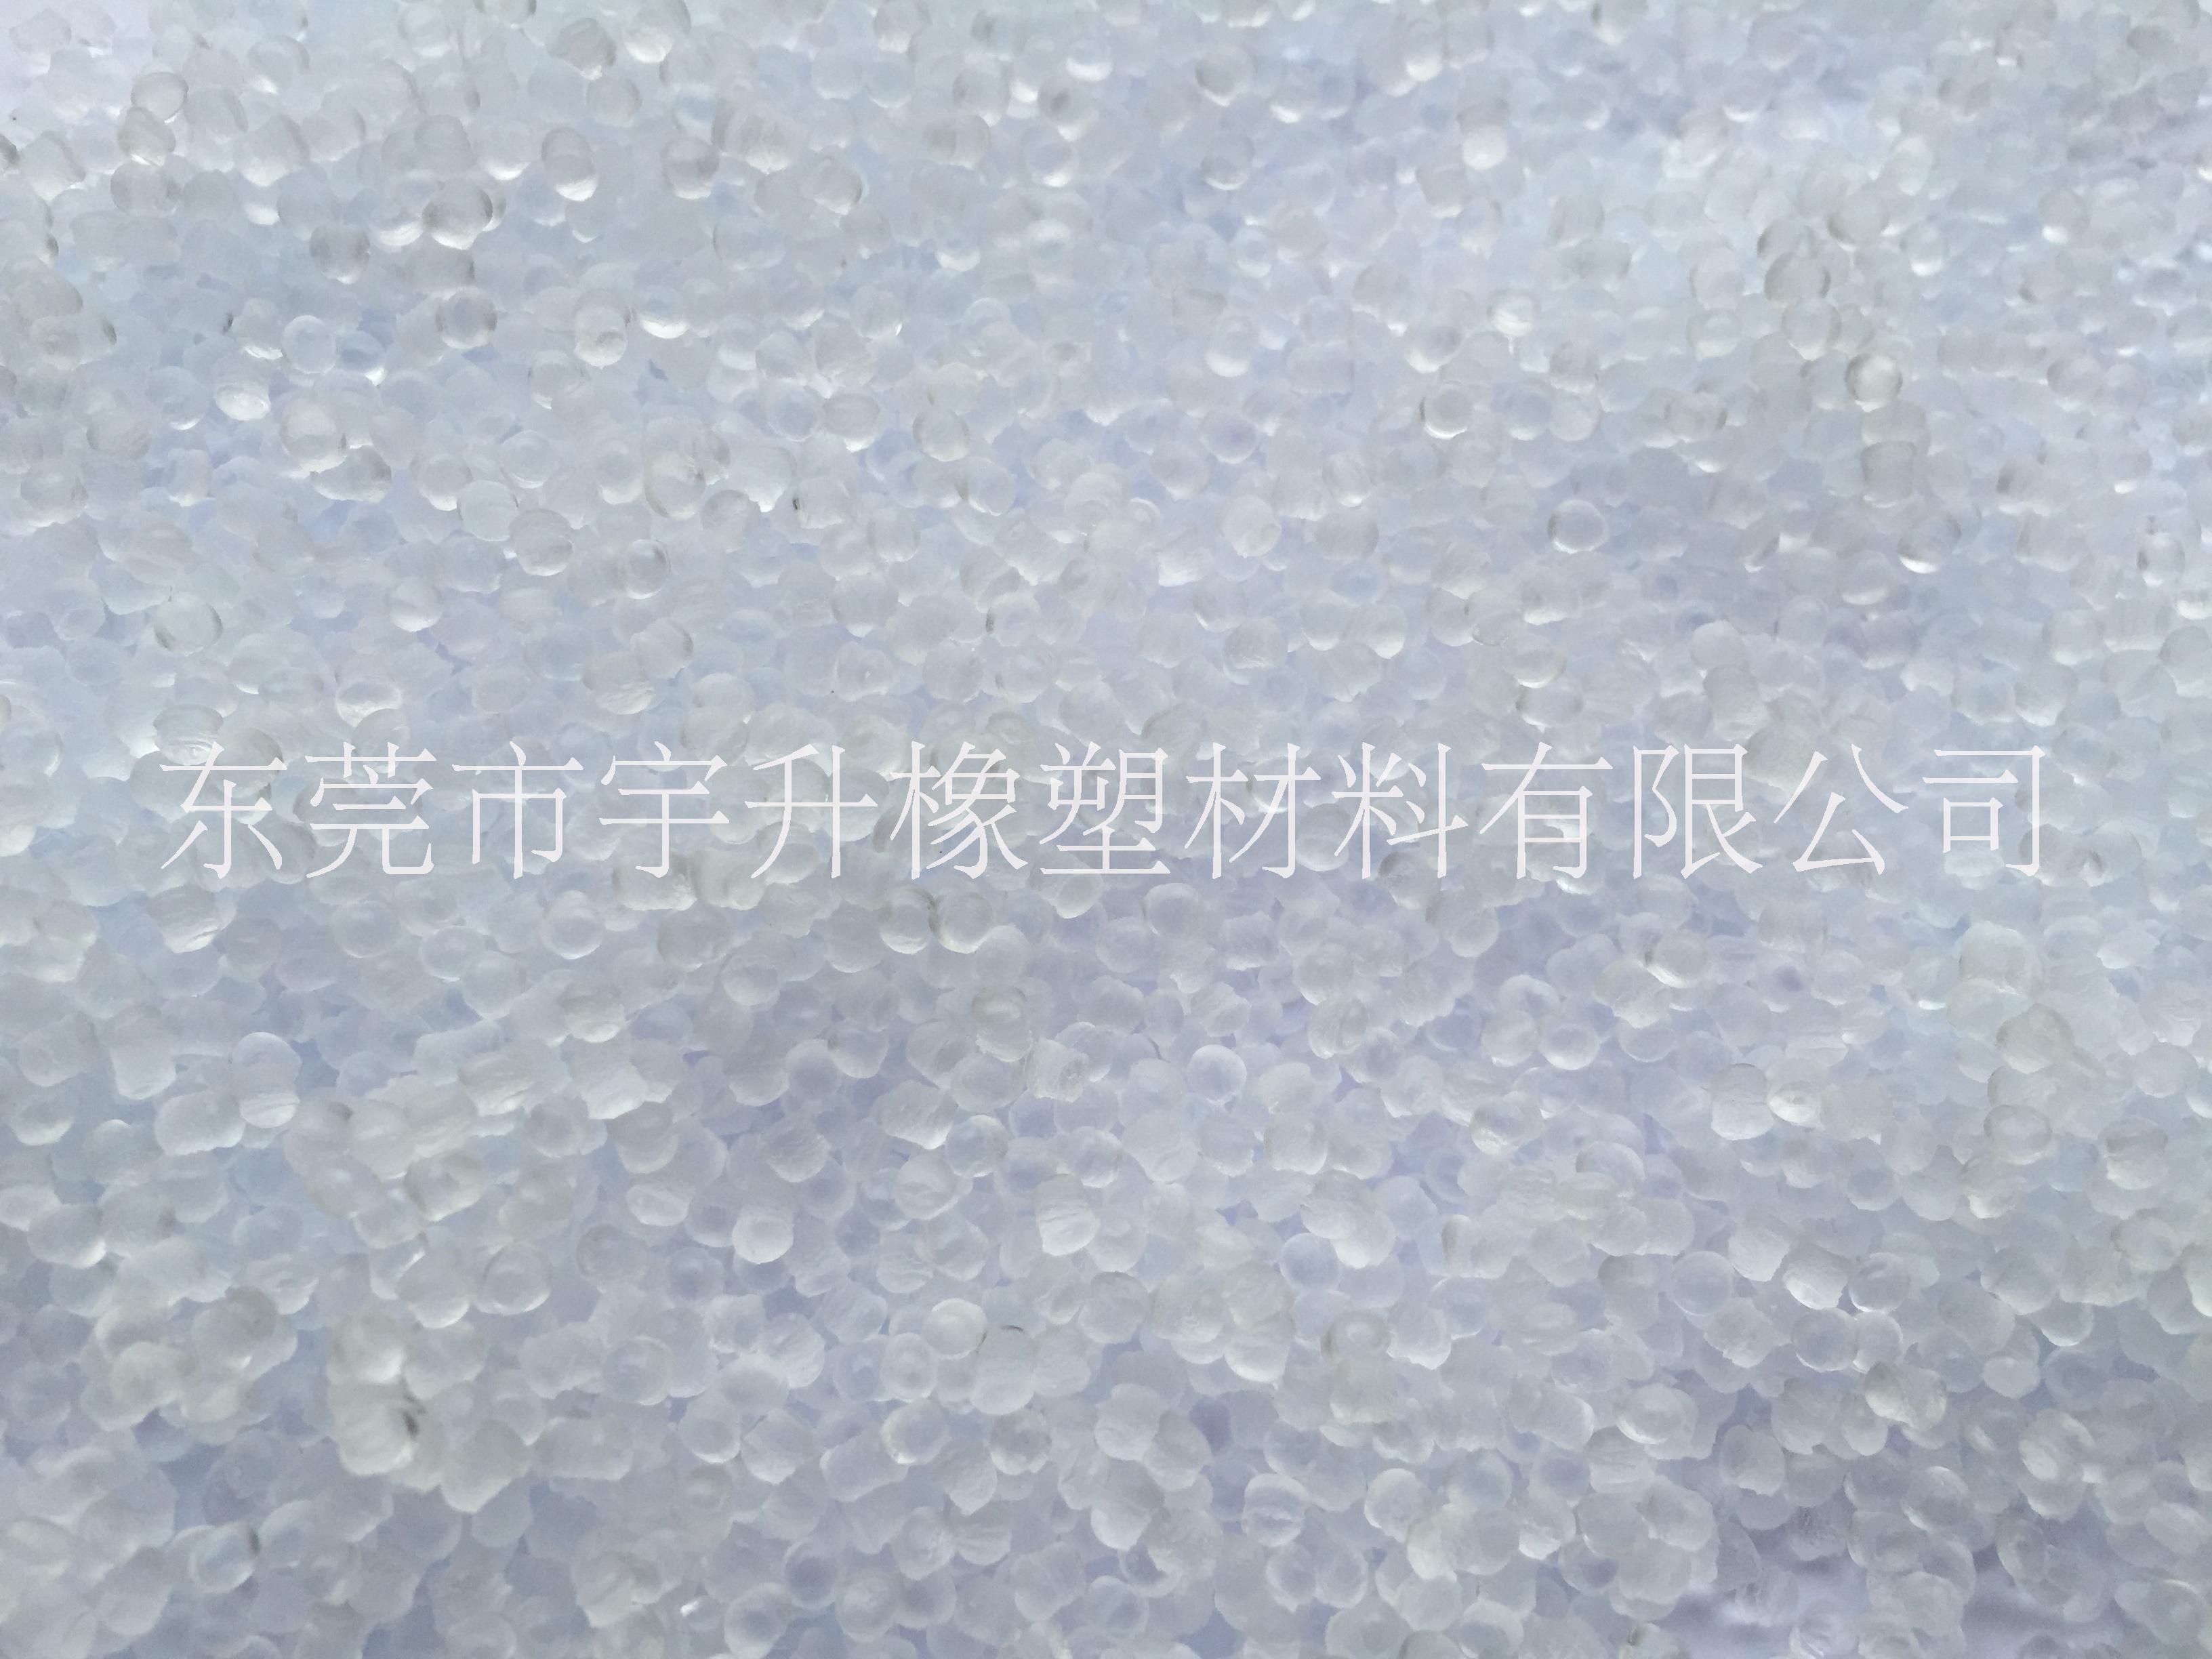 TPE-0TPE-0A乳白透明肤色原料SEBS脚套料高韧性